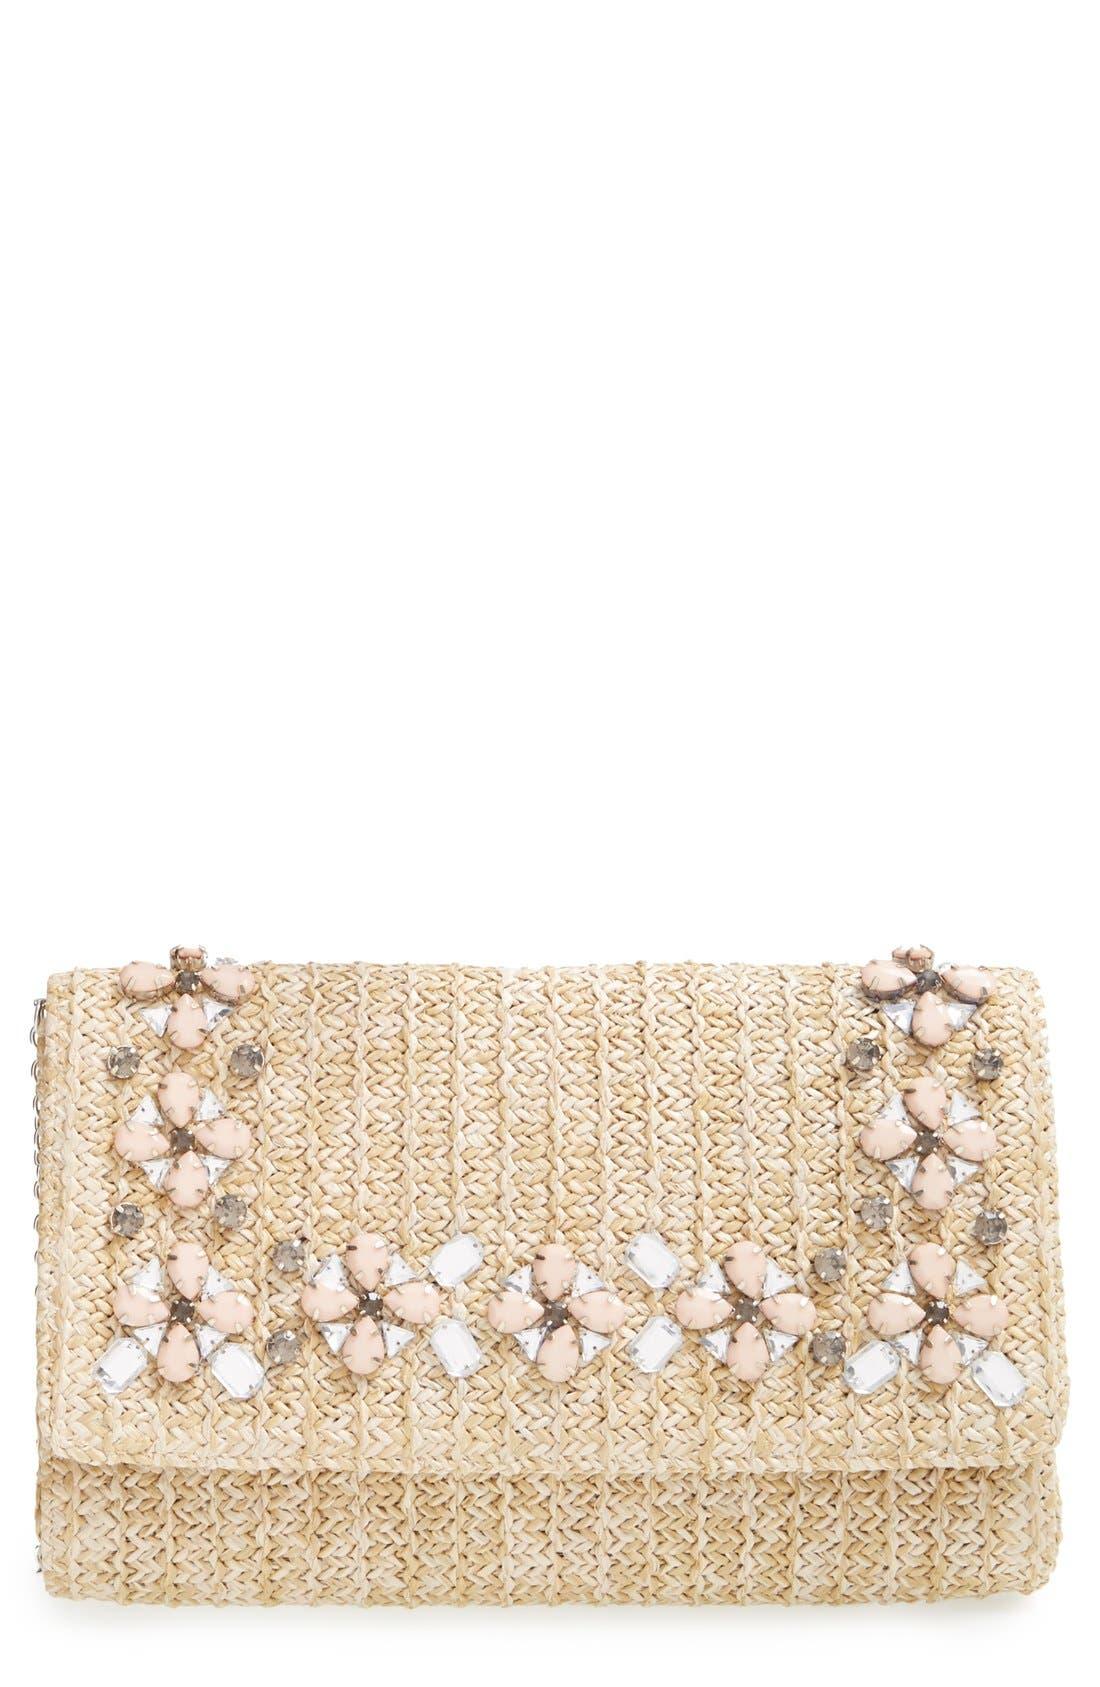 Main Image - Glint Embellished Straw Clutch